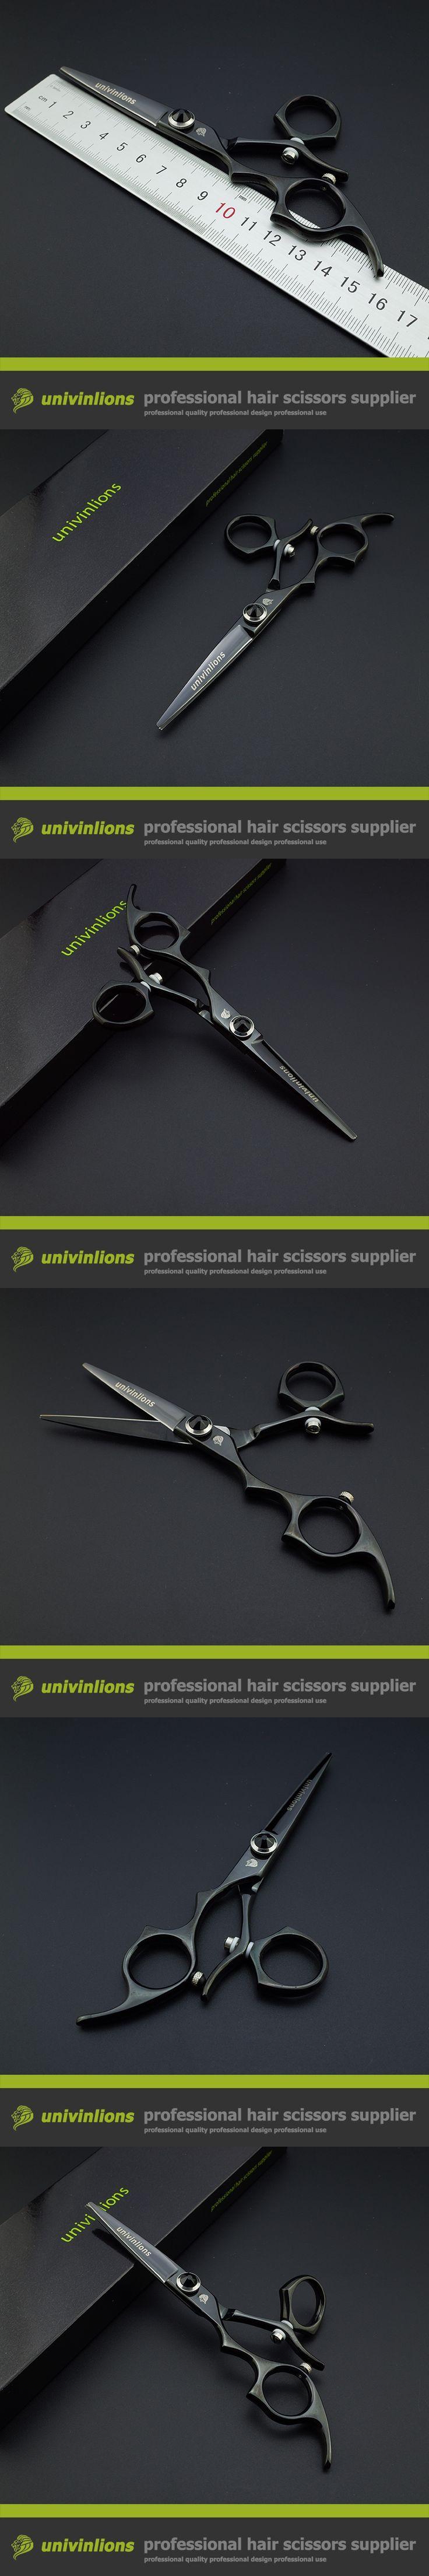 "5.5"" swivel left handed scissors professional hairdressing barber scissors left handed hair cutting shears rotary haircut shears"